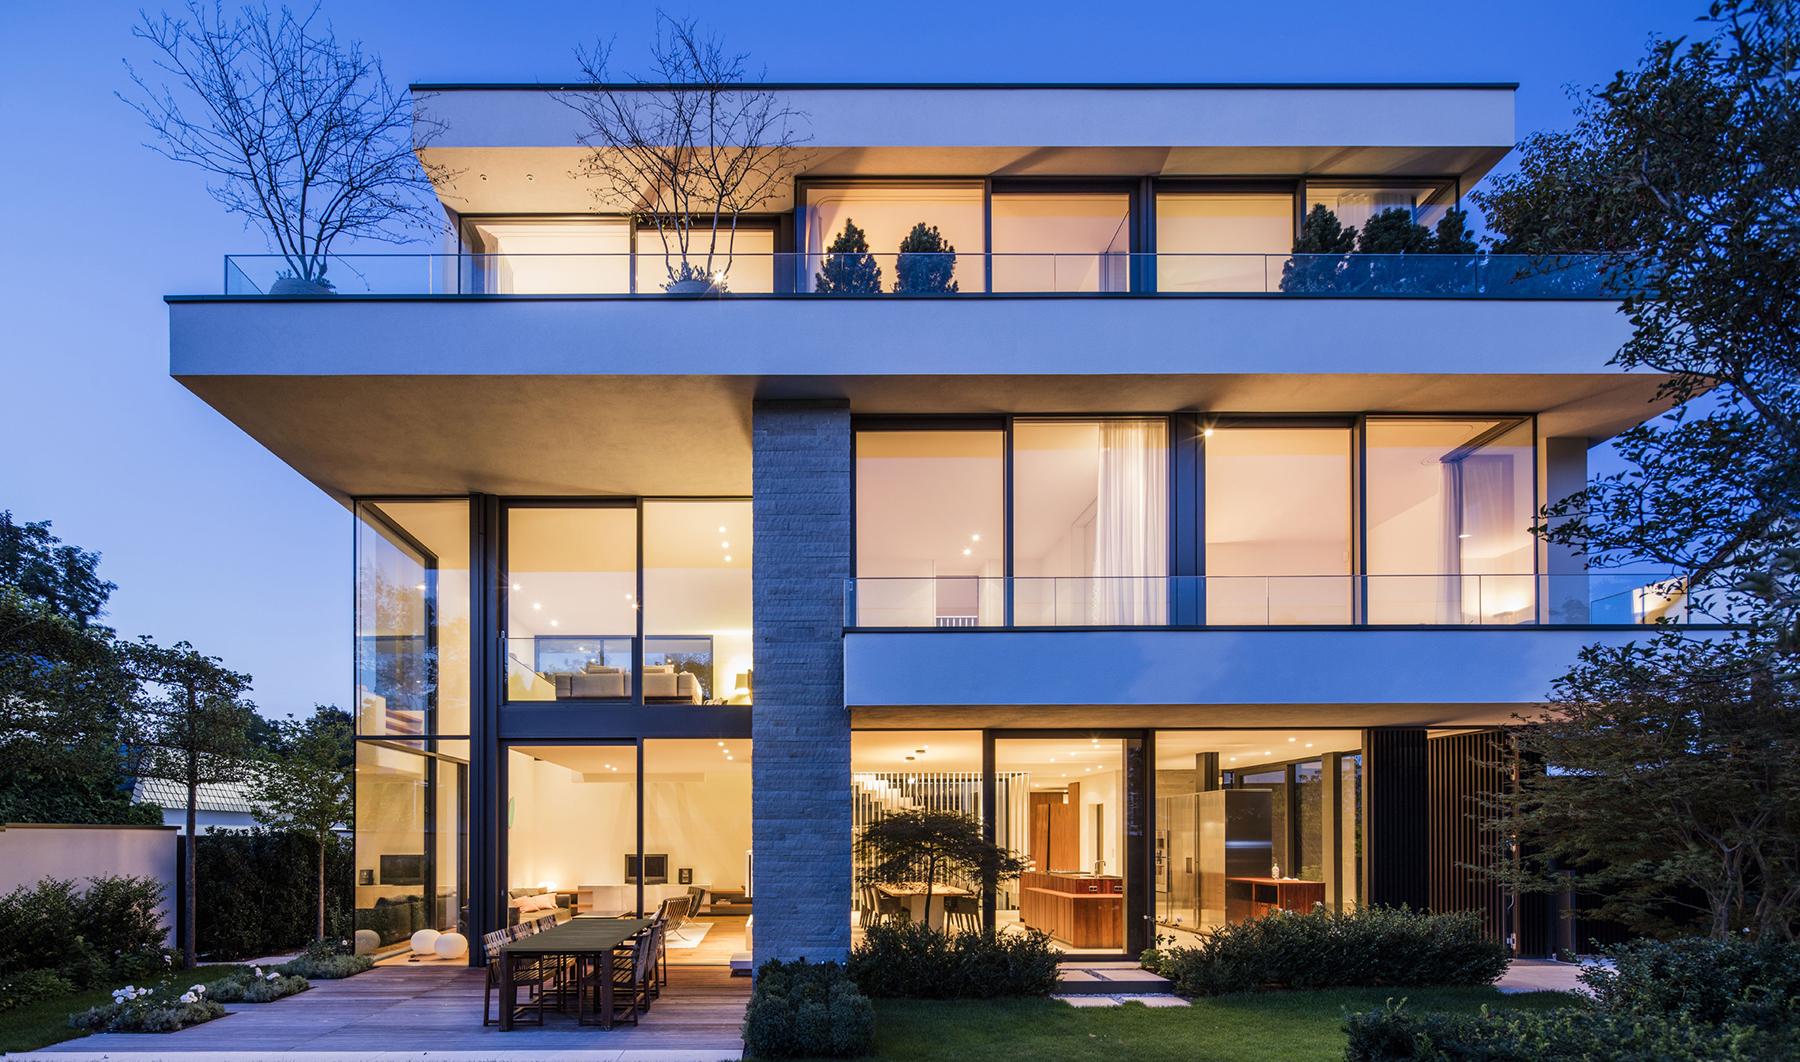 projekt haus ti frankfurt architekten bda fuchs wacker. Black Bedroom Furniture Sets. Home Design Ideas